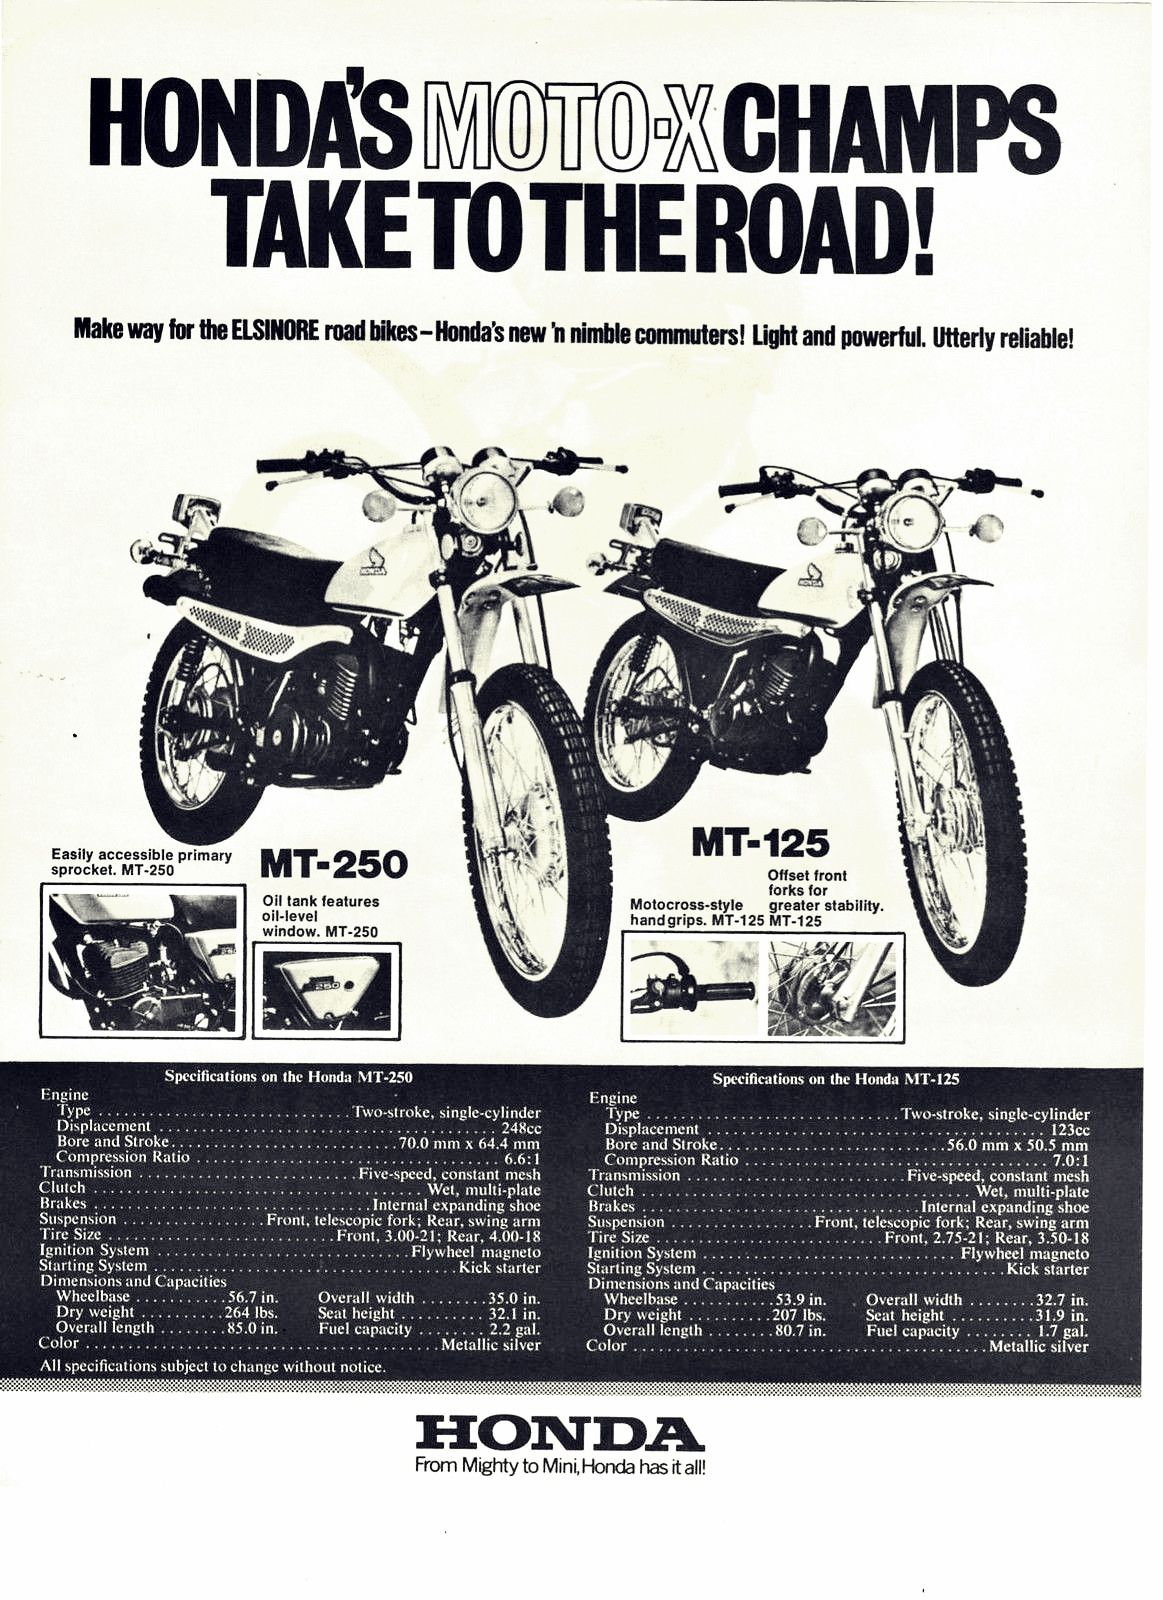 1973 Honda Mt250 125 Moto X Champs Motorcycle Brochure Honda Brochure Motorcycle